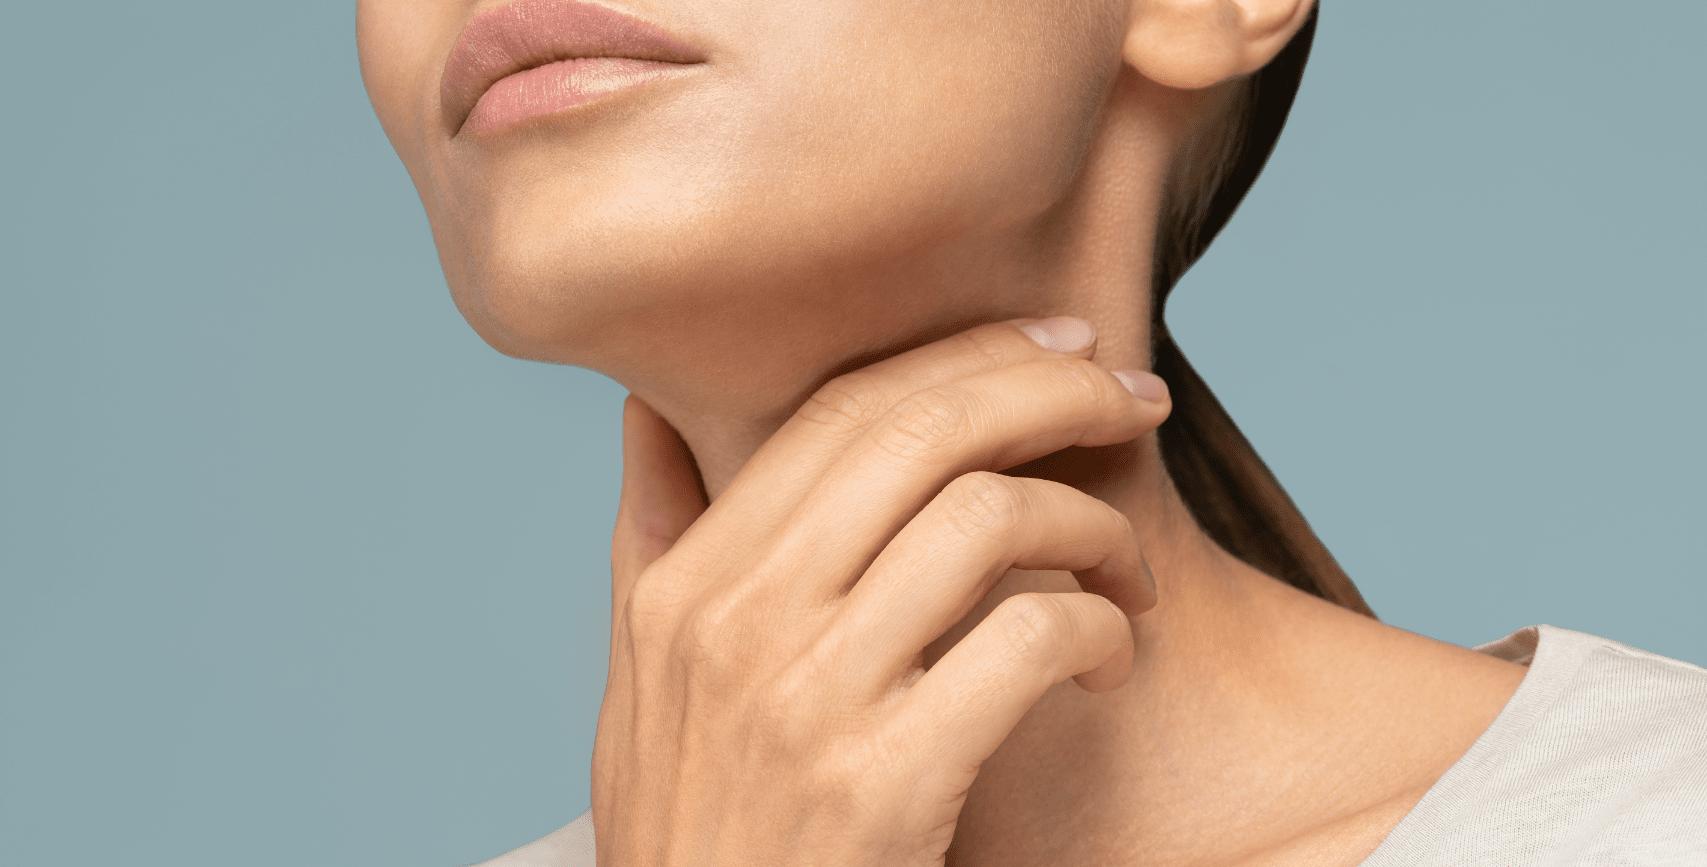 woman-having-sore-throat-tonsillitis-suffering-f-2@3x